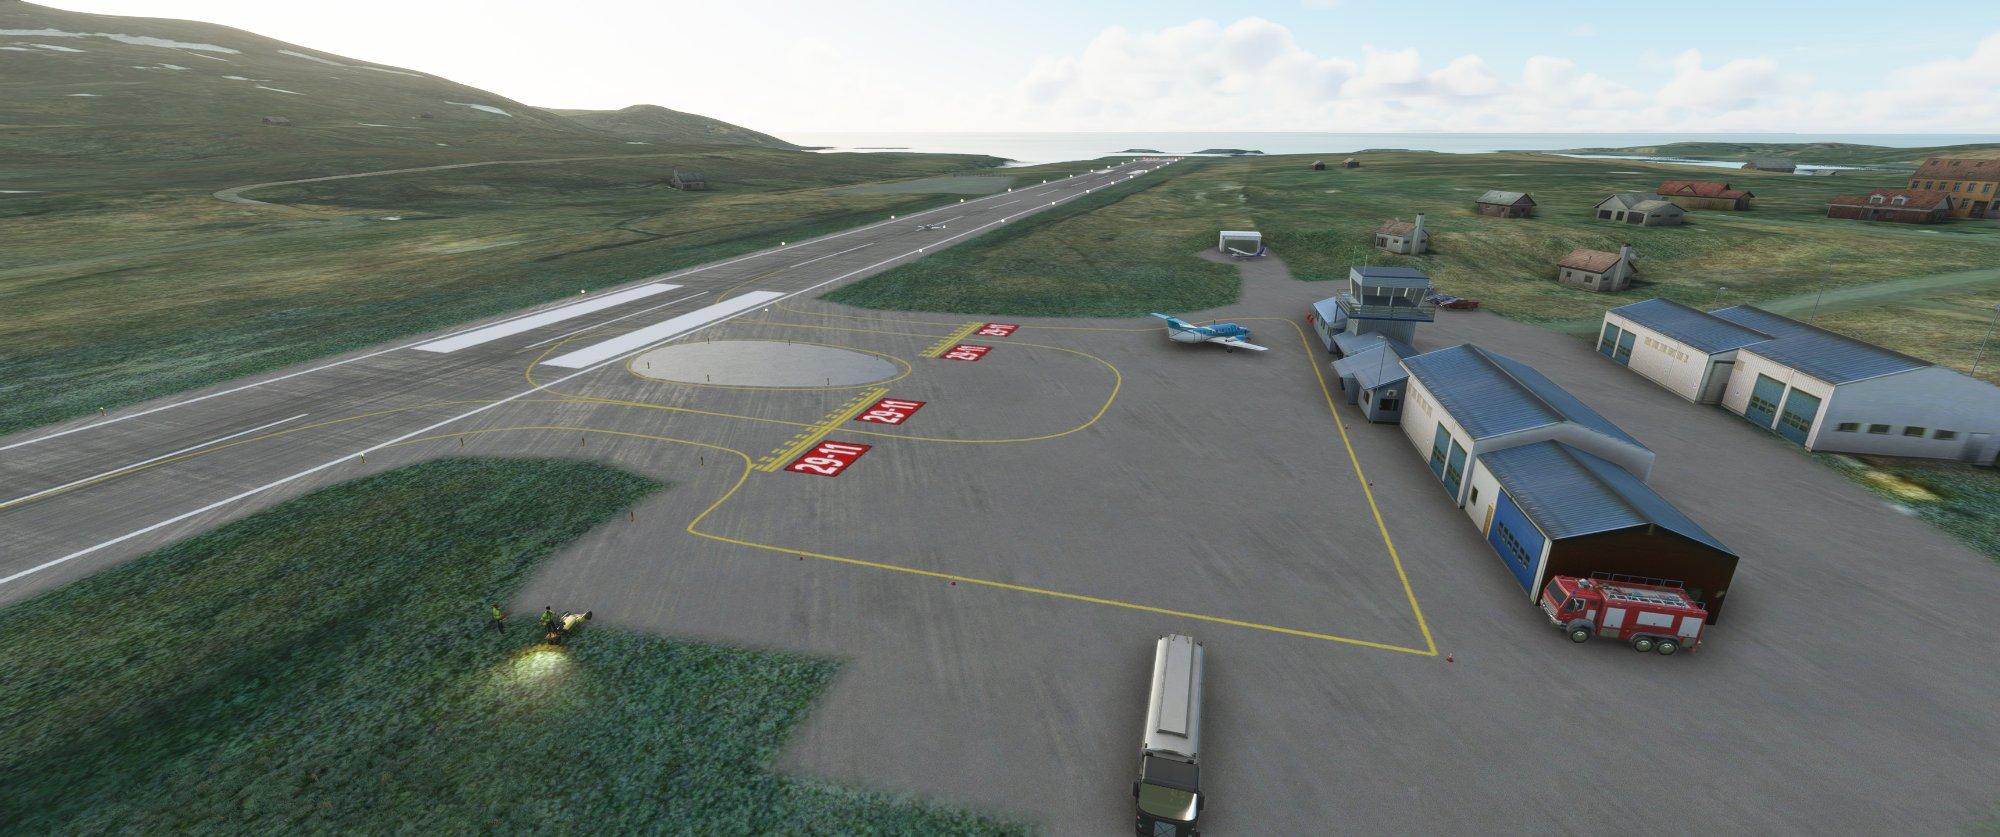 Microsoft Flight Simulator Screenshot 2020.11.19 - 17.52.22.65.jpg